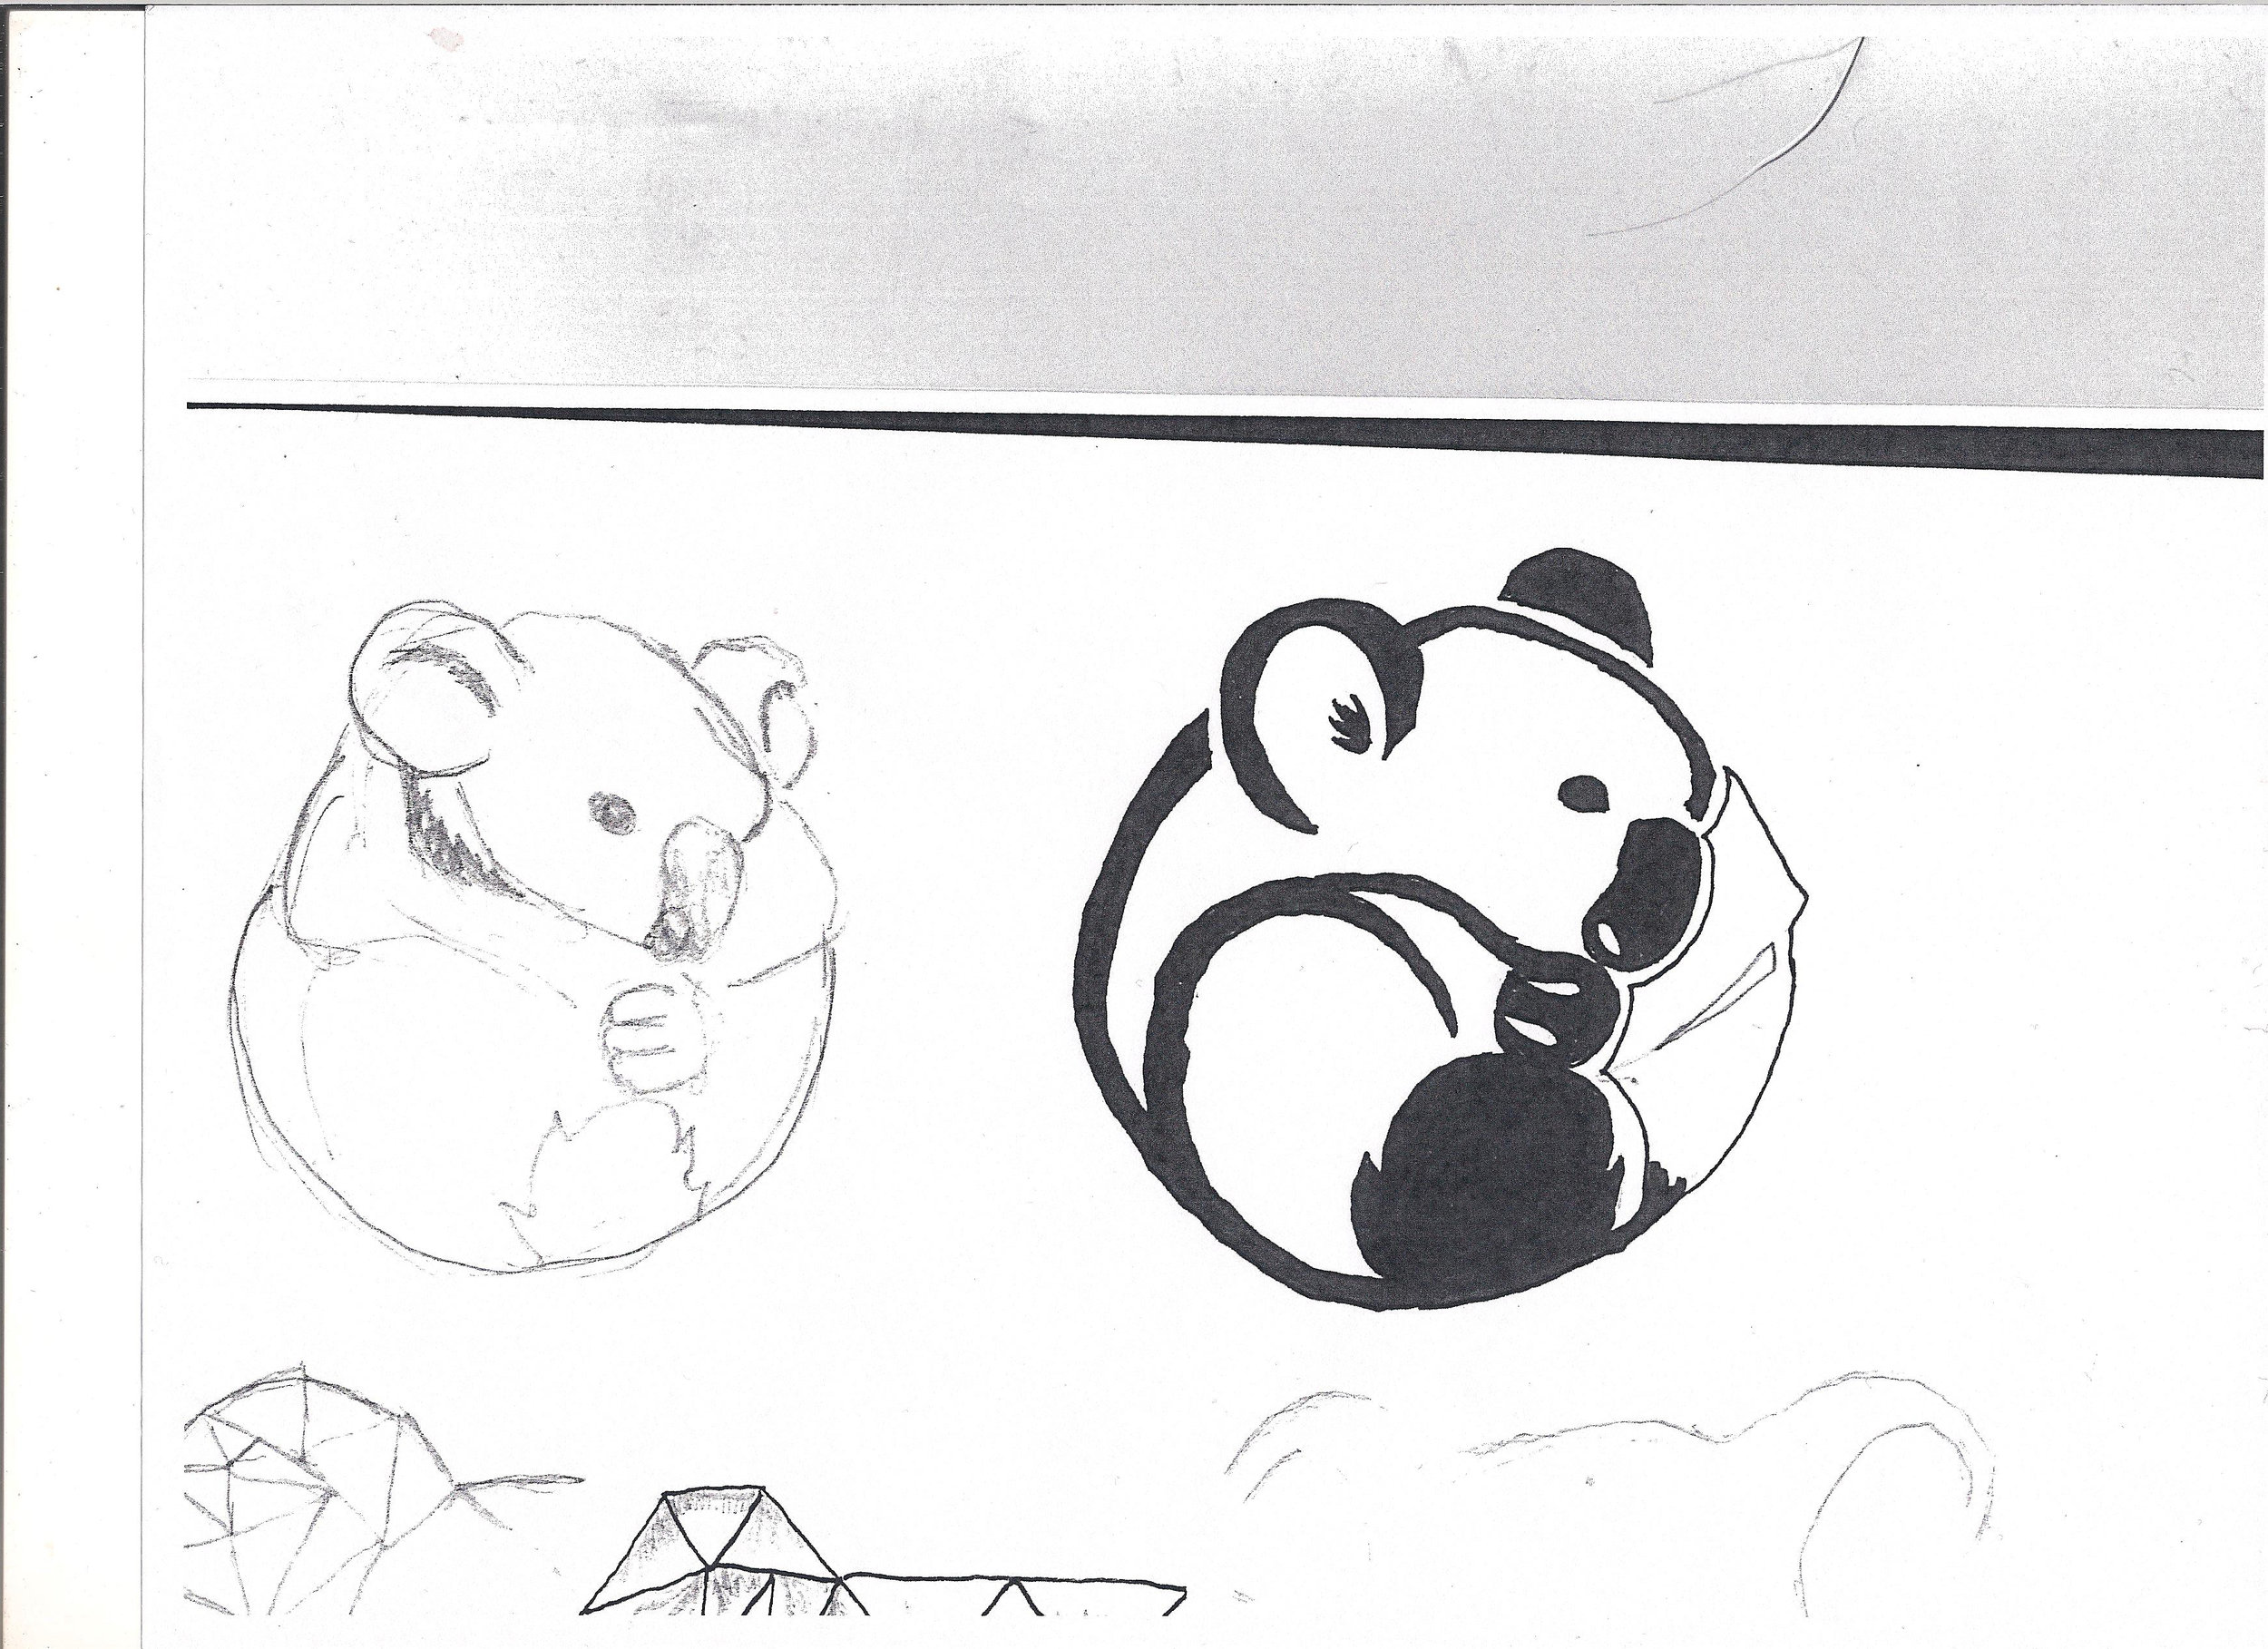 koalaSketch.jpeg